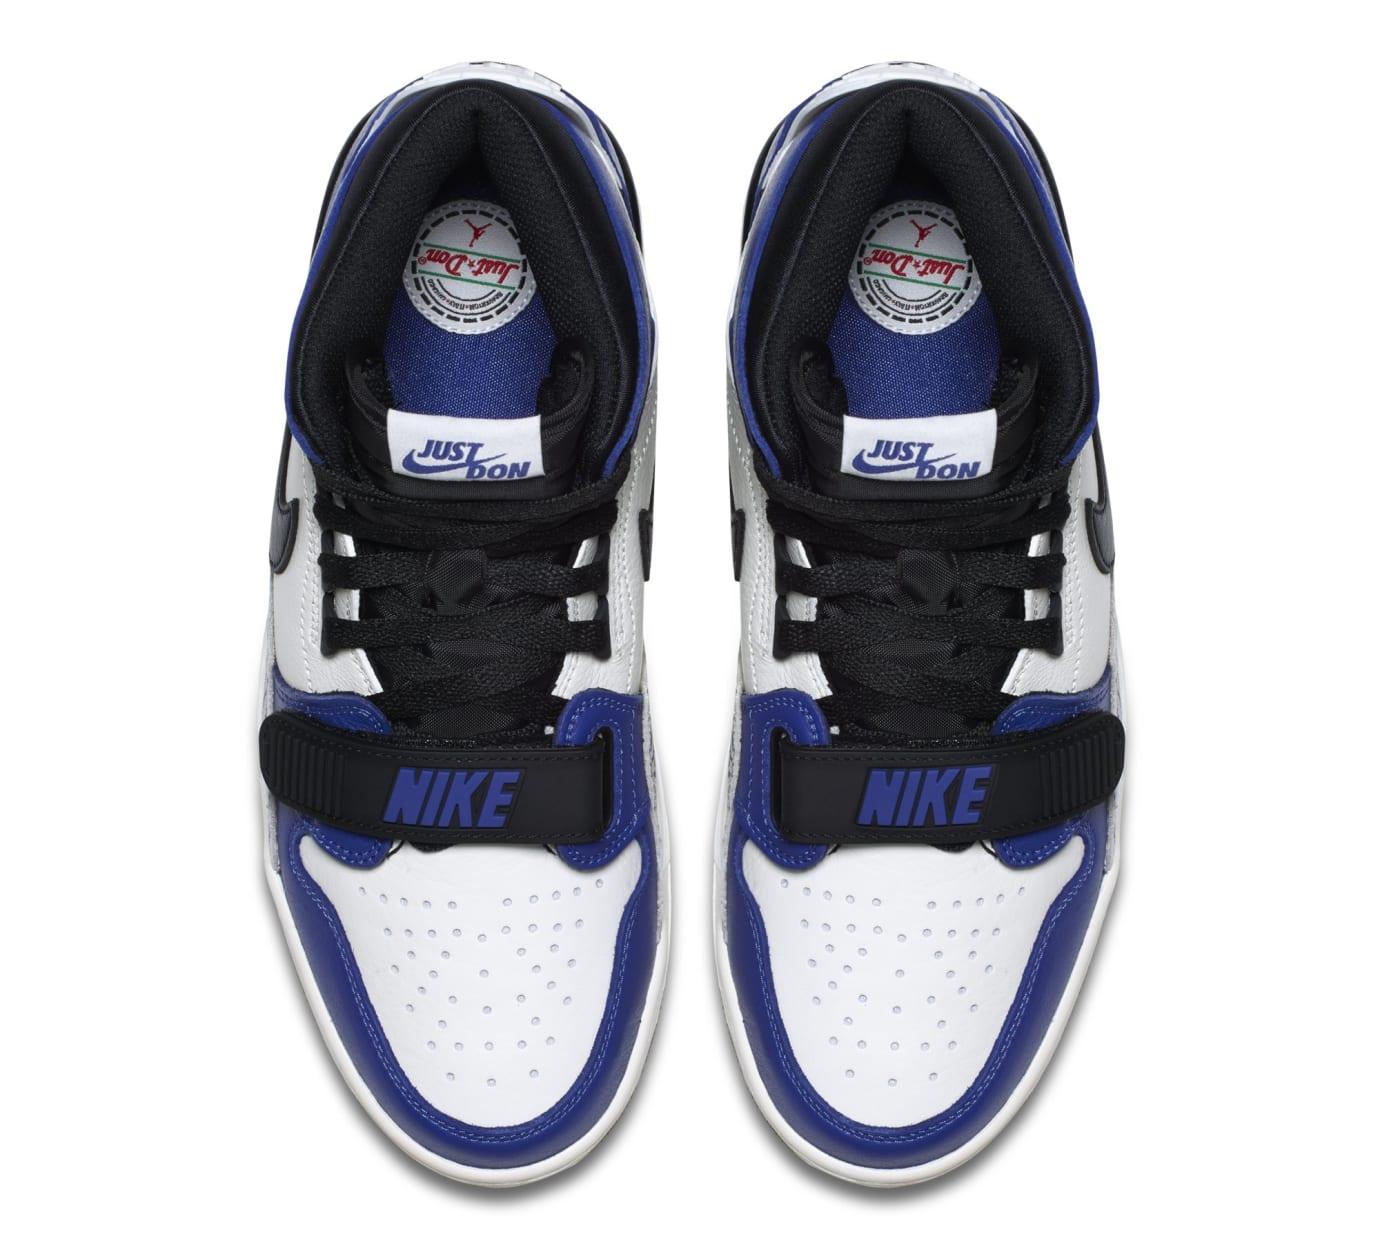 super cheap e94a9 391a8 Image via Nike Don C x Jordan Legacy 312  Storm Blue  AQ4160-104 (Top)